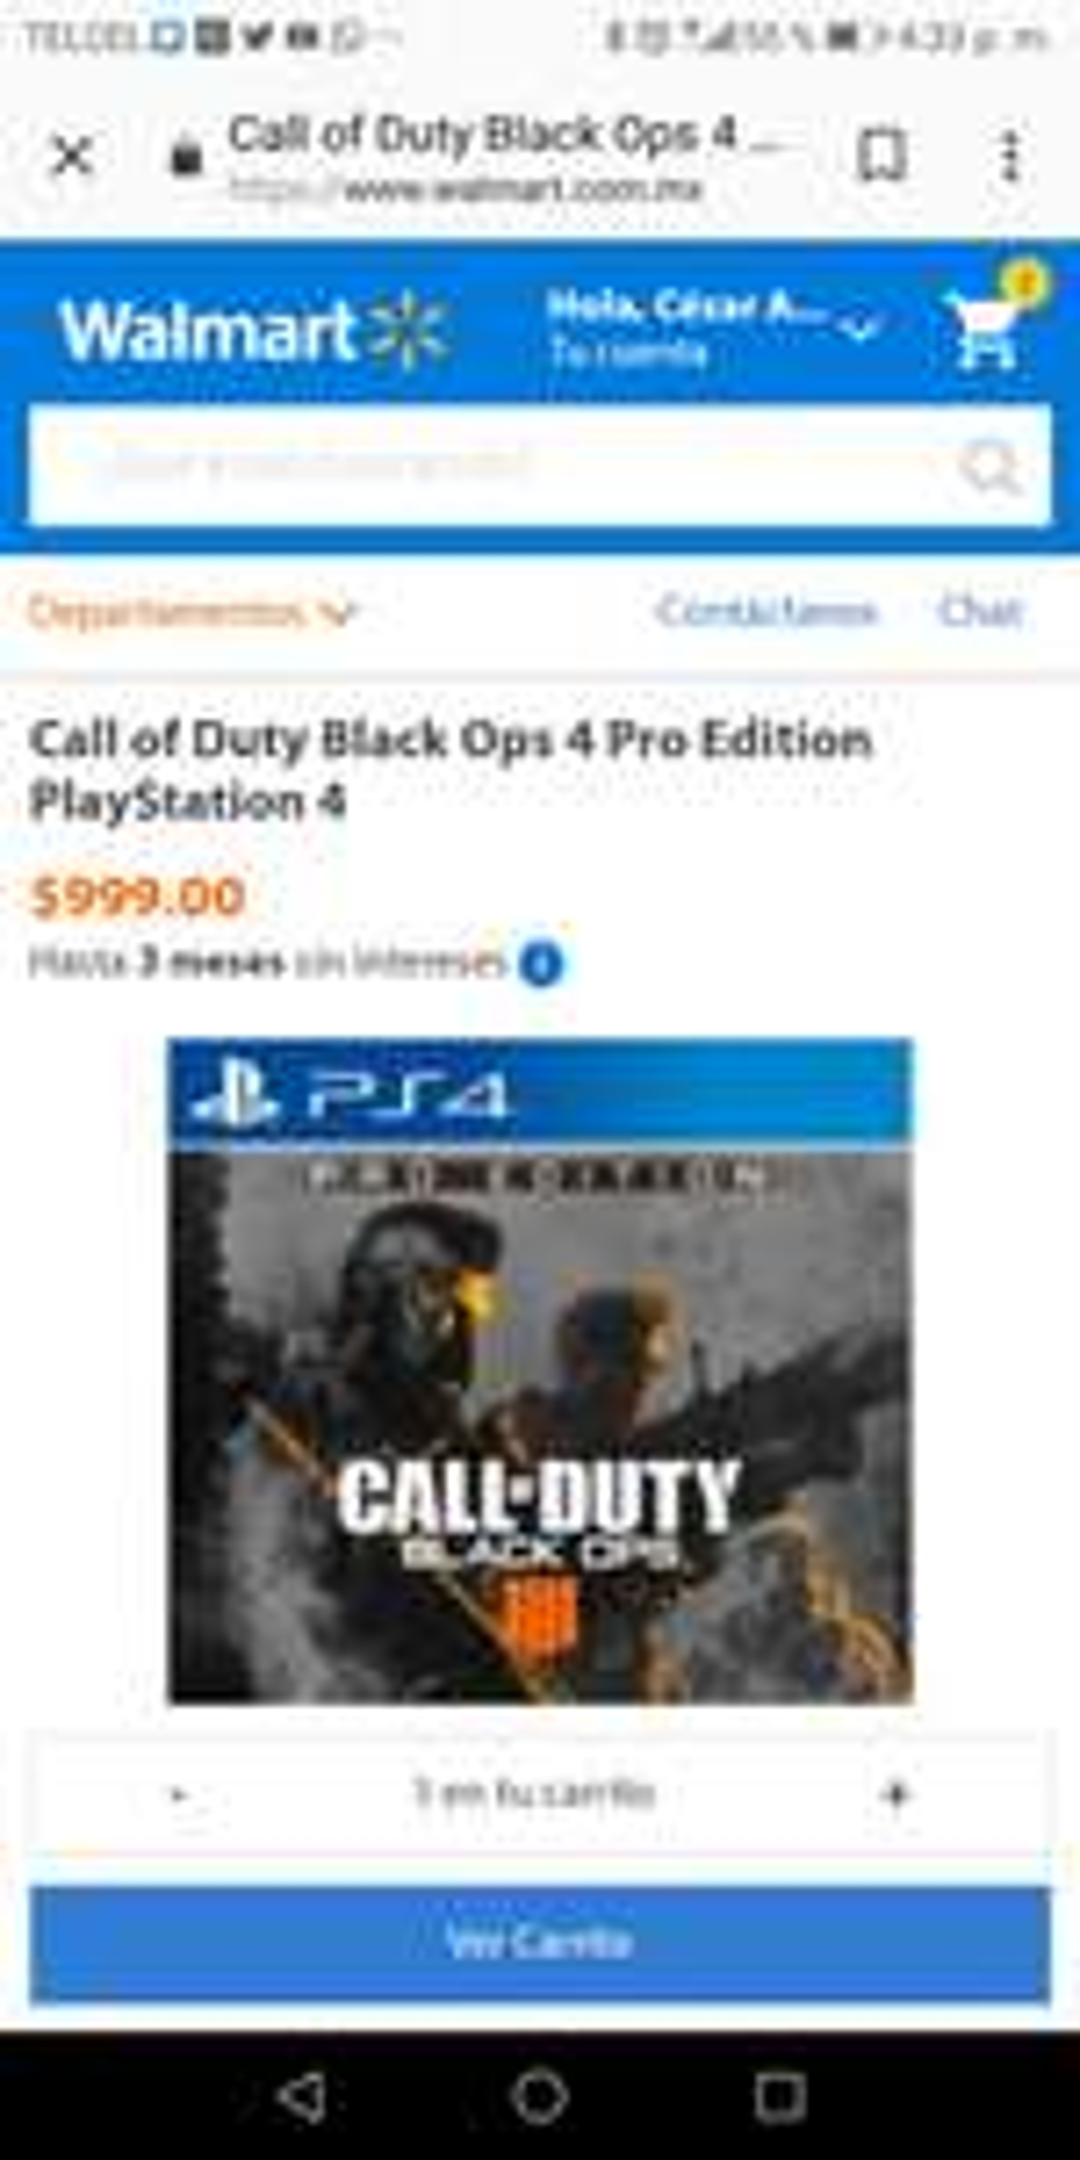 Walmart en línea: Call of Duty Black Ops 4 Pro Edition para PS4